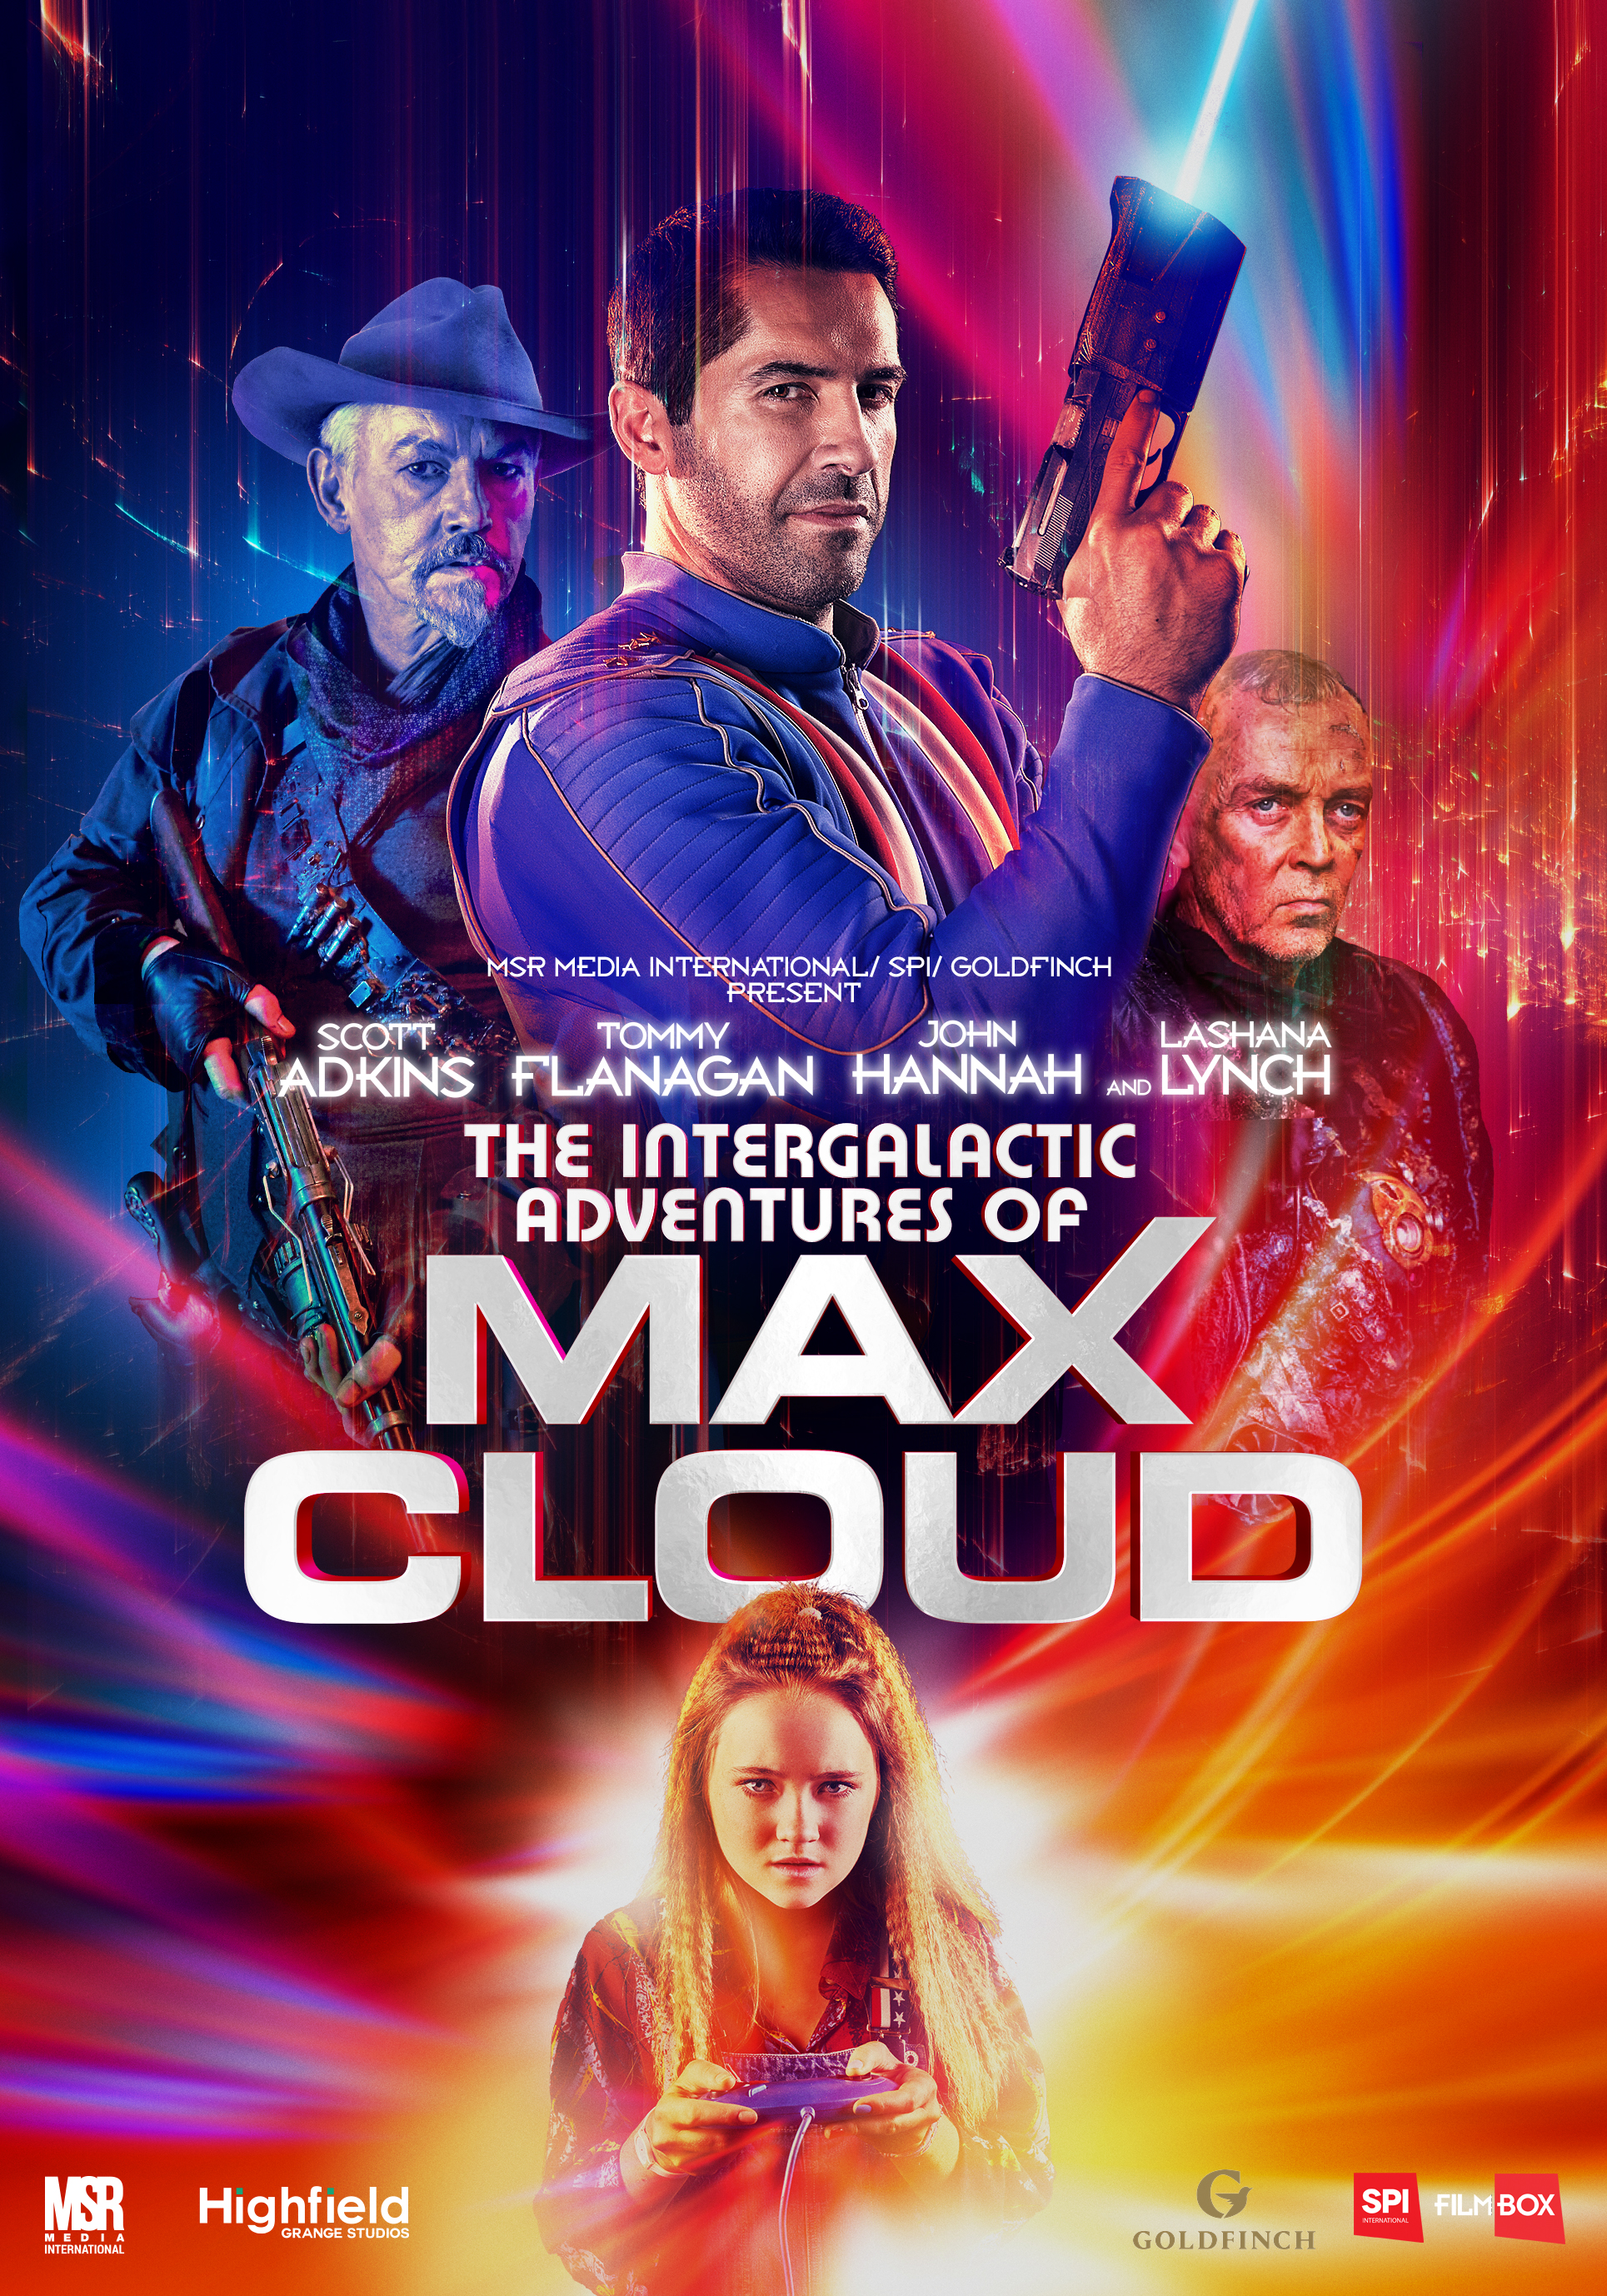 The Intergalactic Adventures of Max Cloud - IMDb